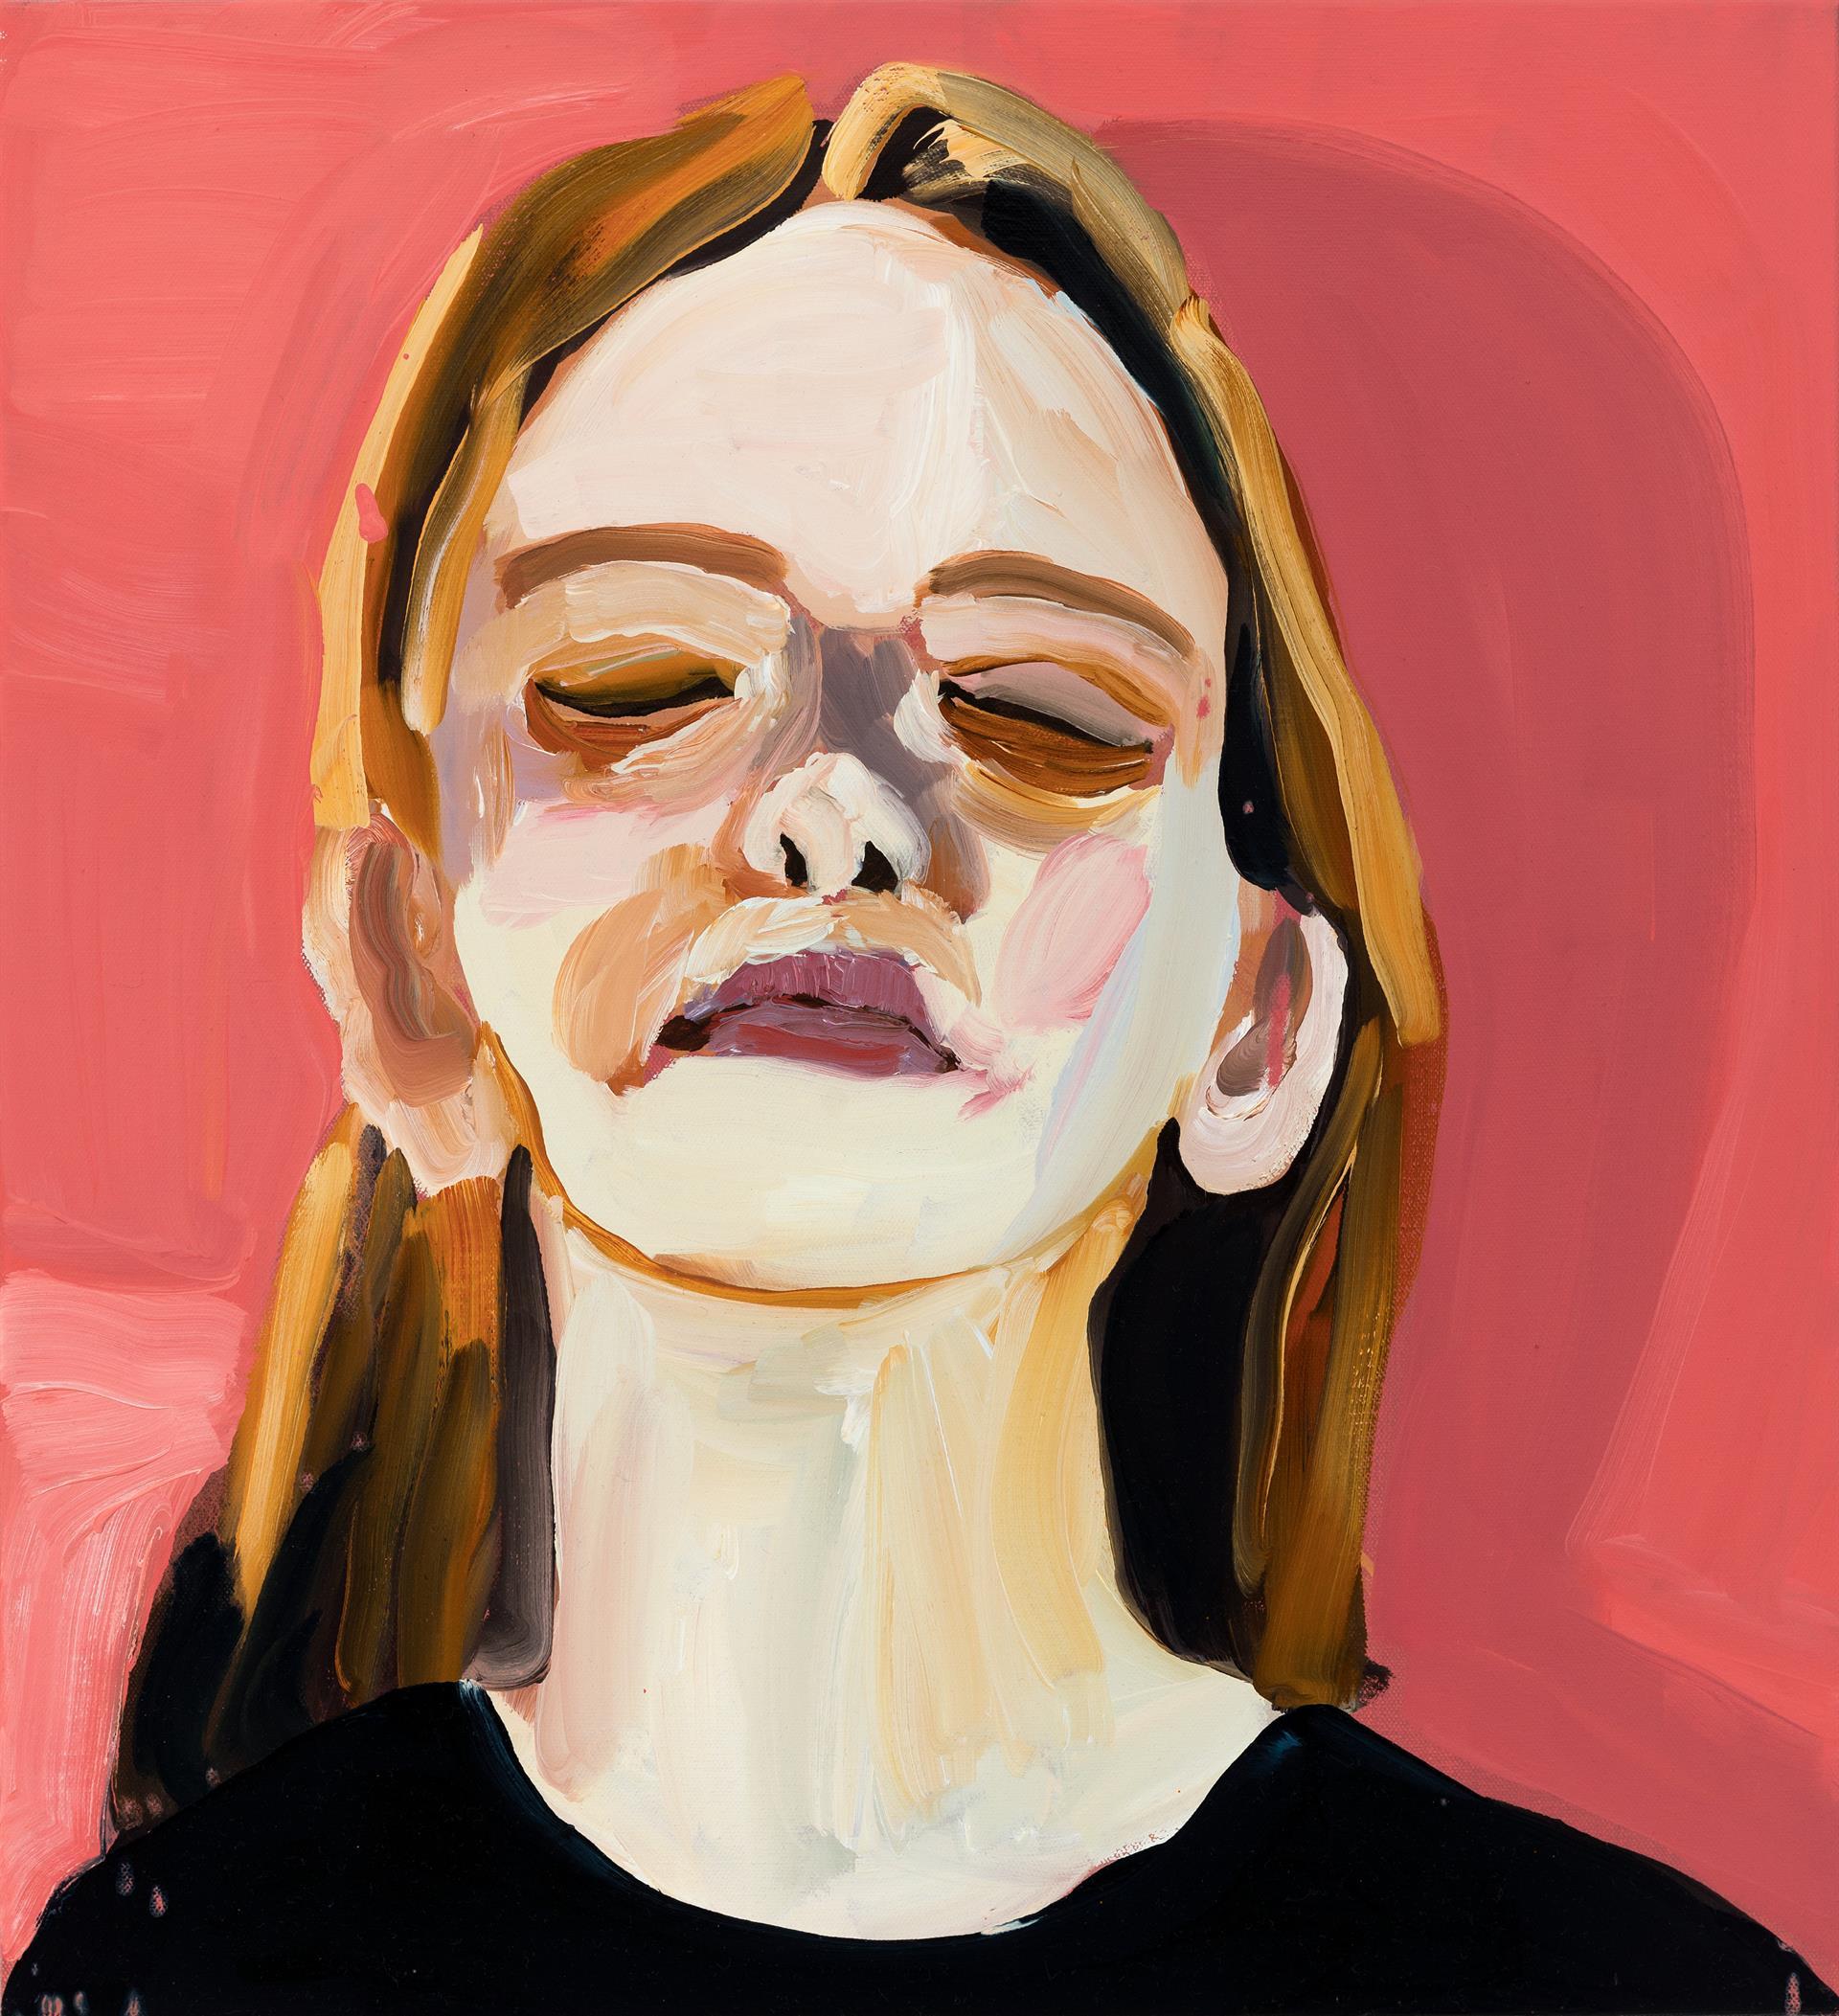 Jenni Hiltunen_painting_2017_After_Image